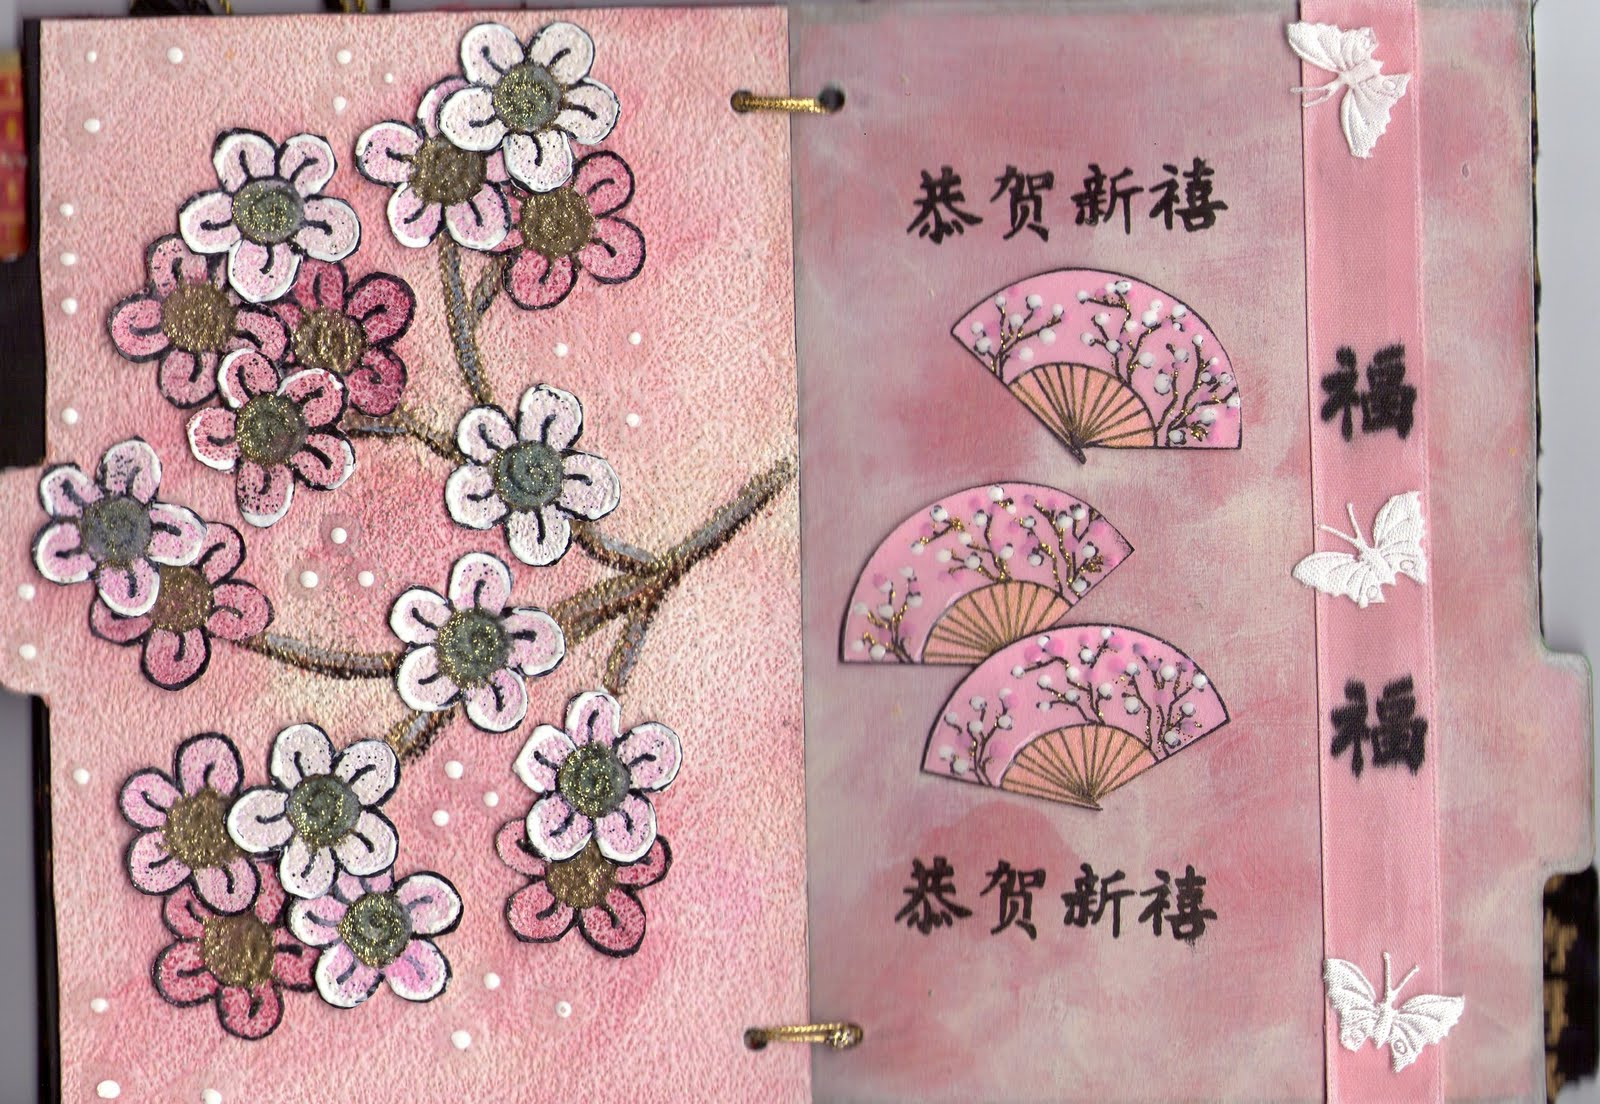 http://1.bp.blogspot.com/_Eu3T77OKImk/THey7IlfcaI/AAAAAAAAAC4/jVd7xRC7wW0/s1600/page+5+%26+6.jpg